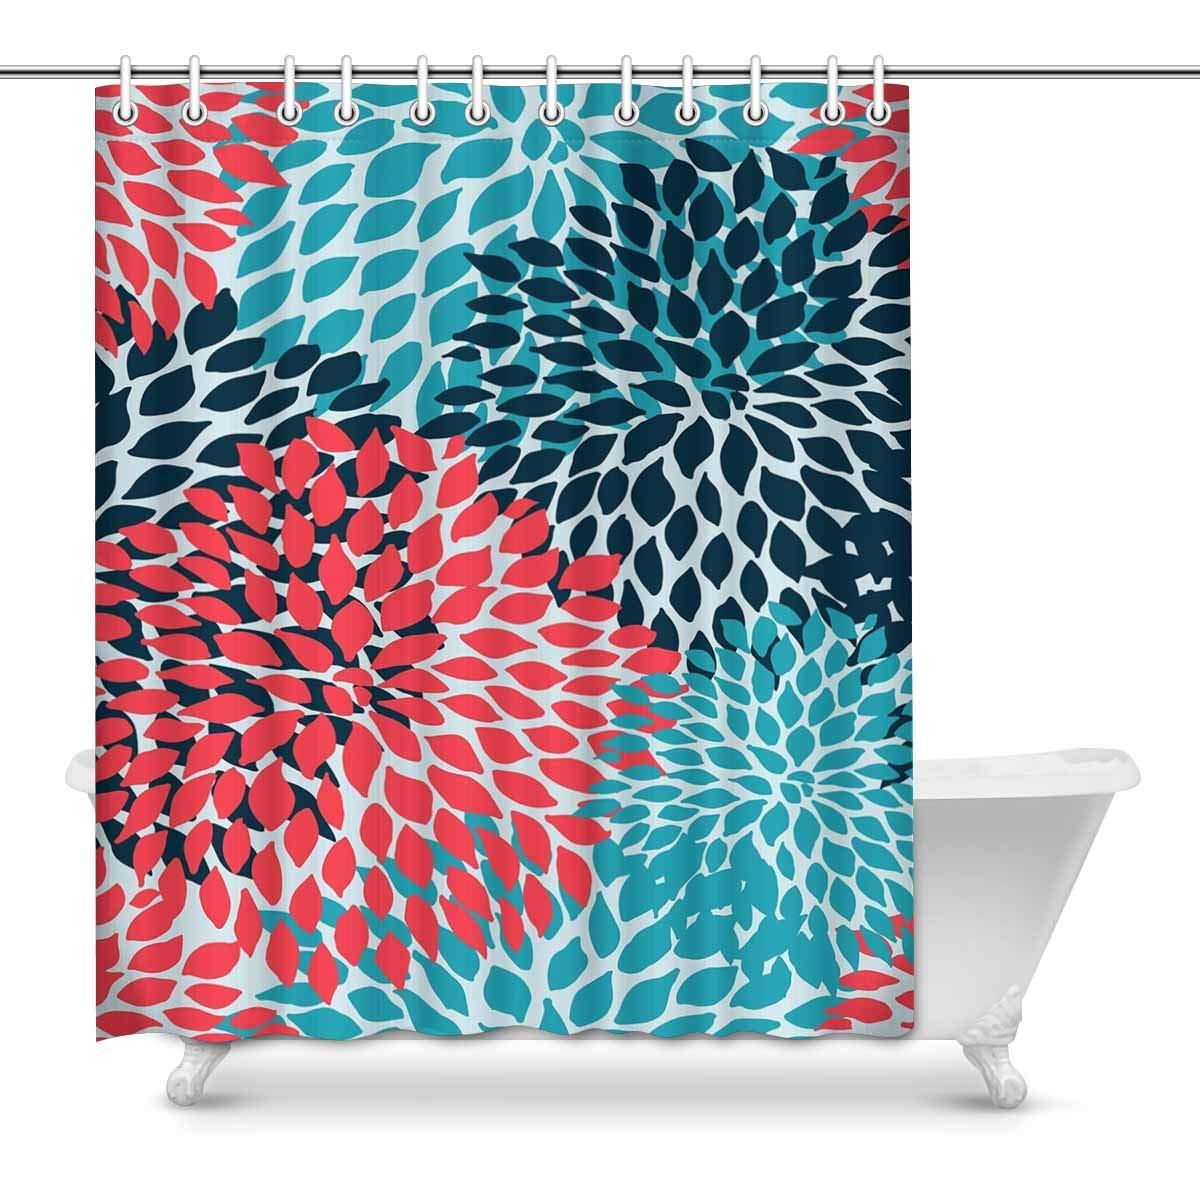 pop dahlia pinnata flower teal coral turquoise bathroom decor shower curtain set 60x72 inch